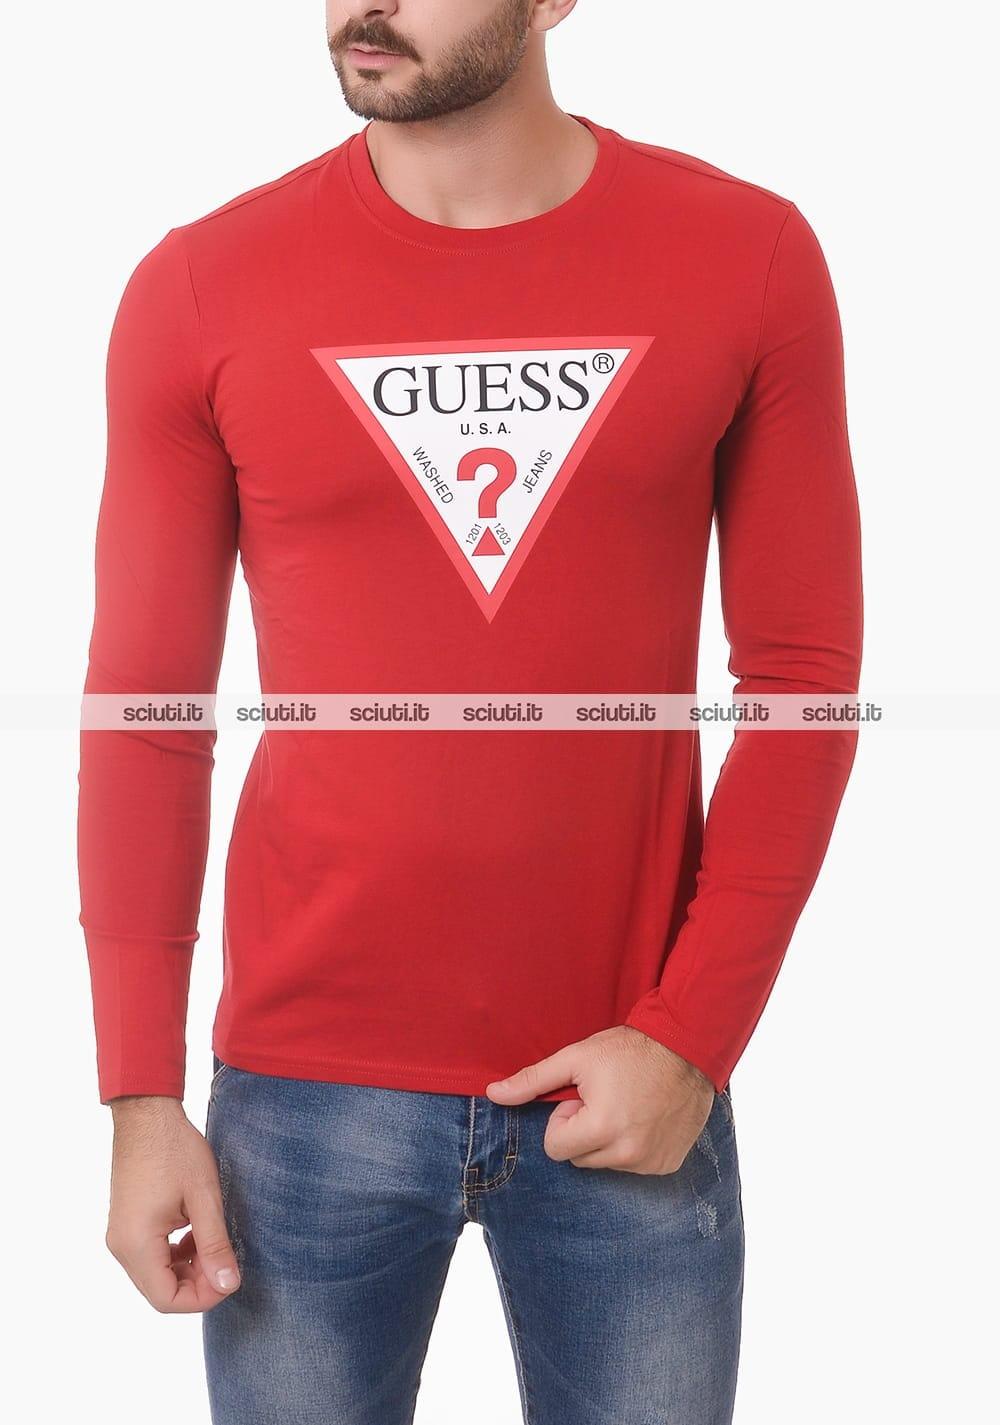 Tshirt Guess uomo bianca logo tee manica lunga